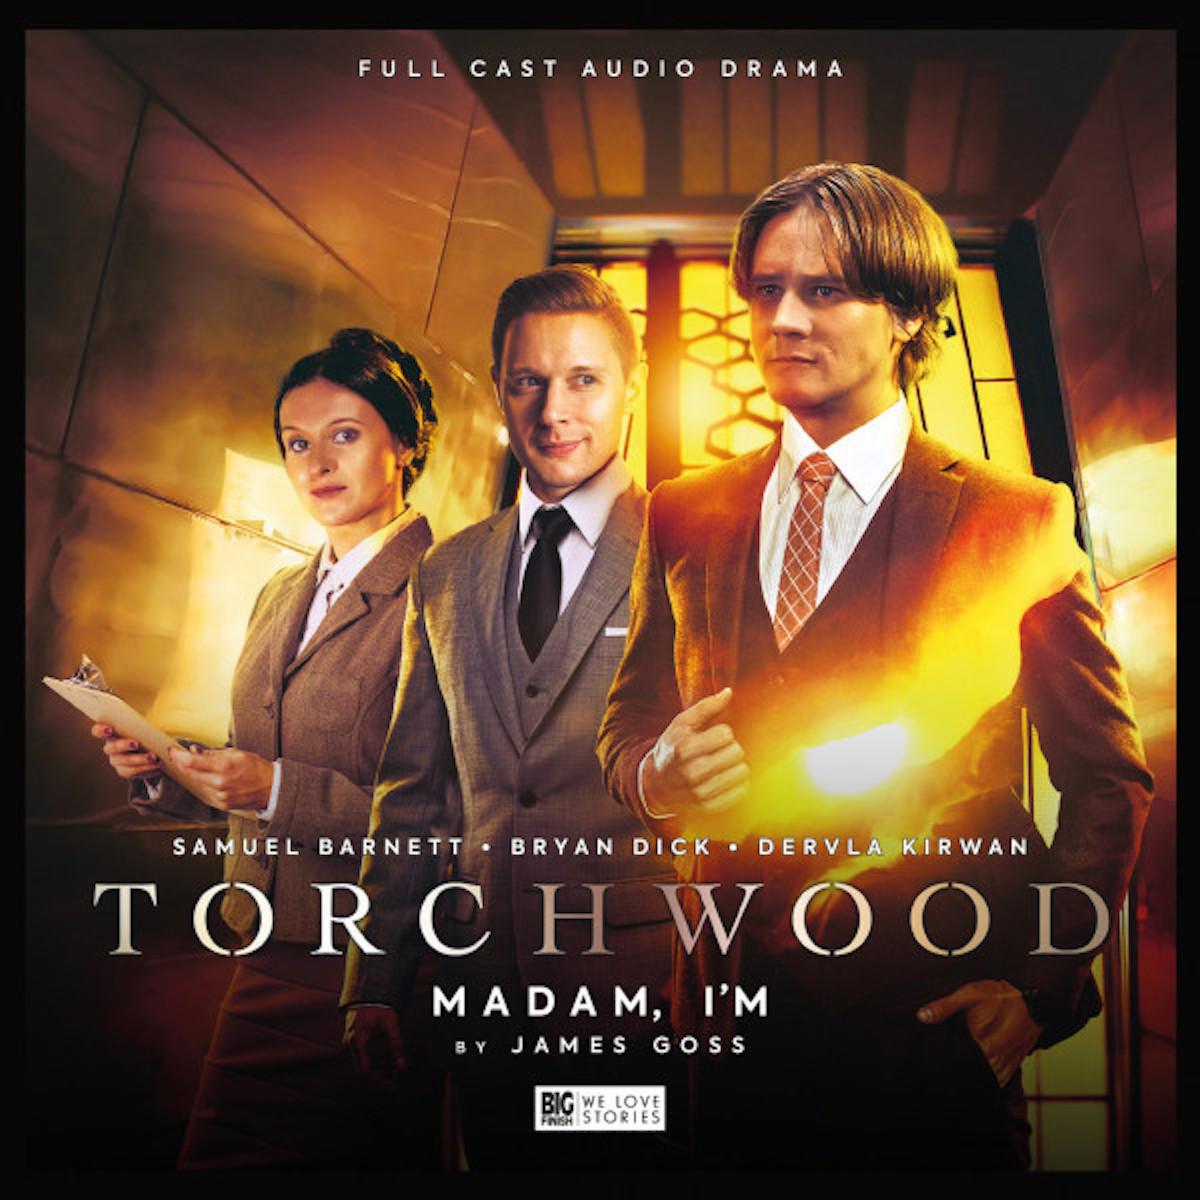 Torchwood: Madam I'm